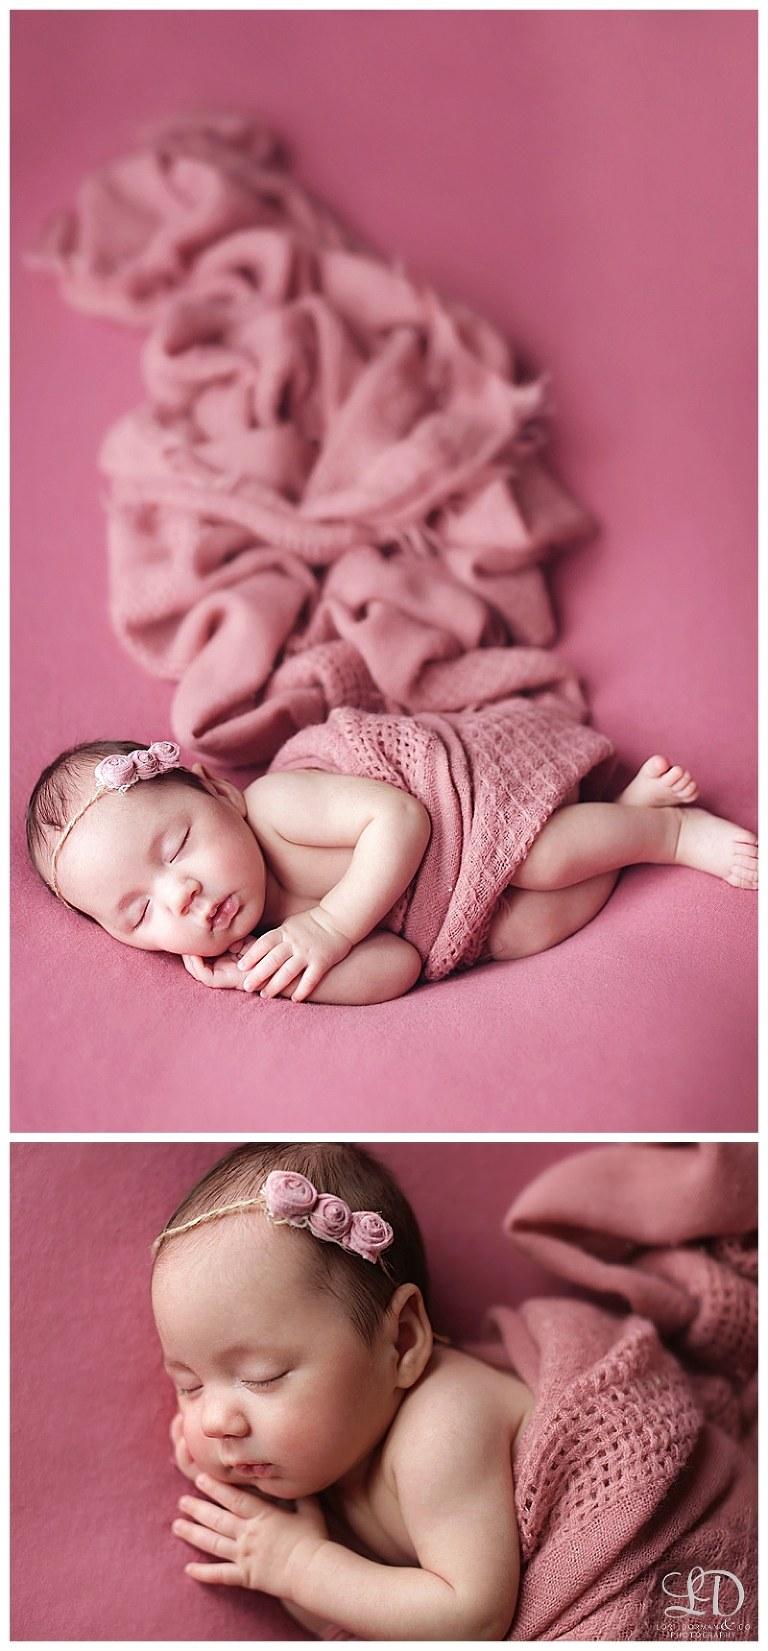 sweet maternity photoshoot-lori dorman photography-maternity boudoir-professional photographer_4728.jpg